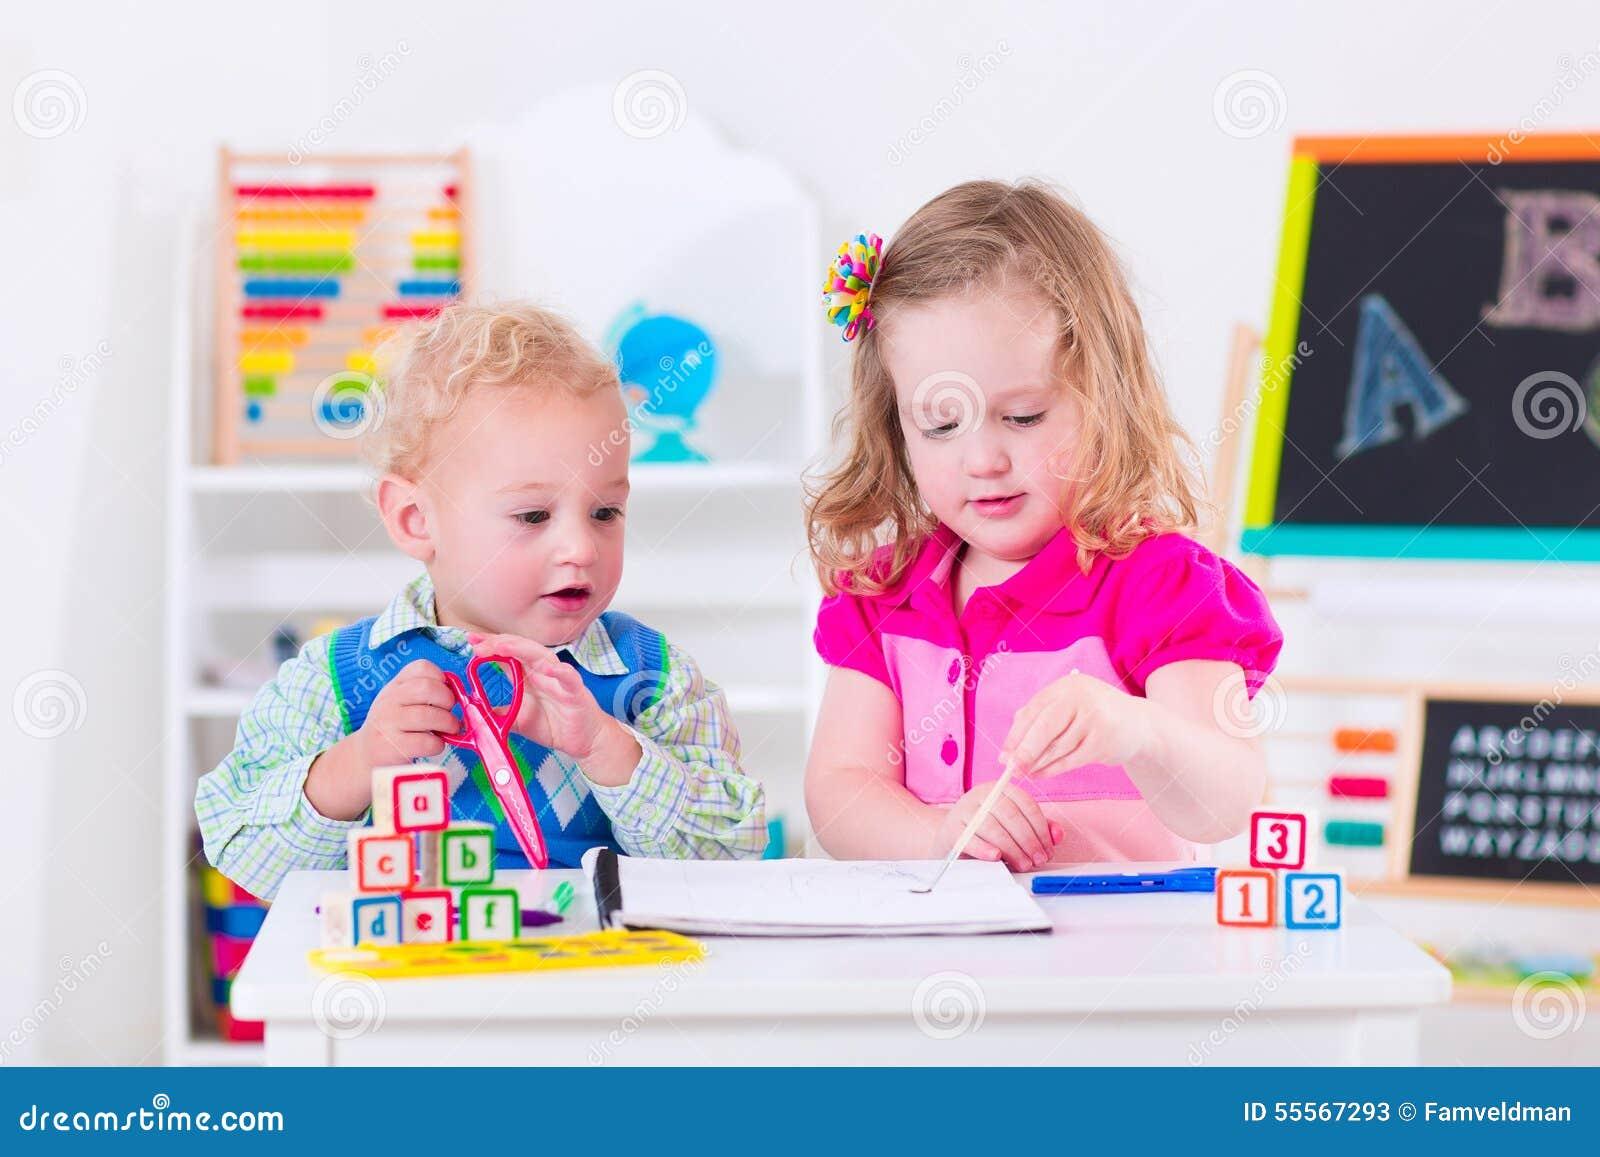 when do children go to preschool at preschool painting stock image image of happy 959